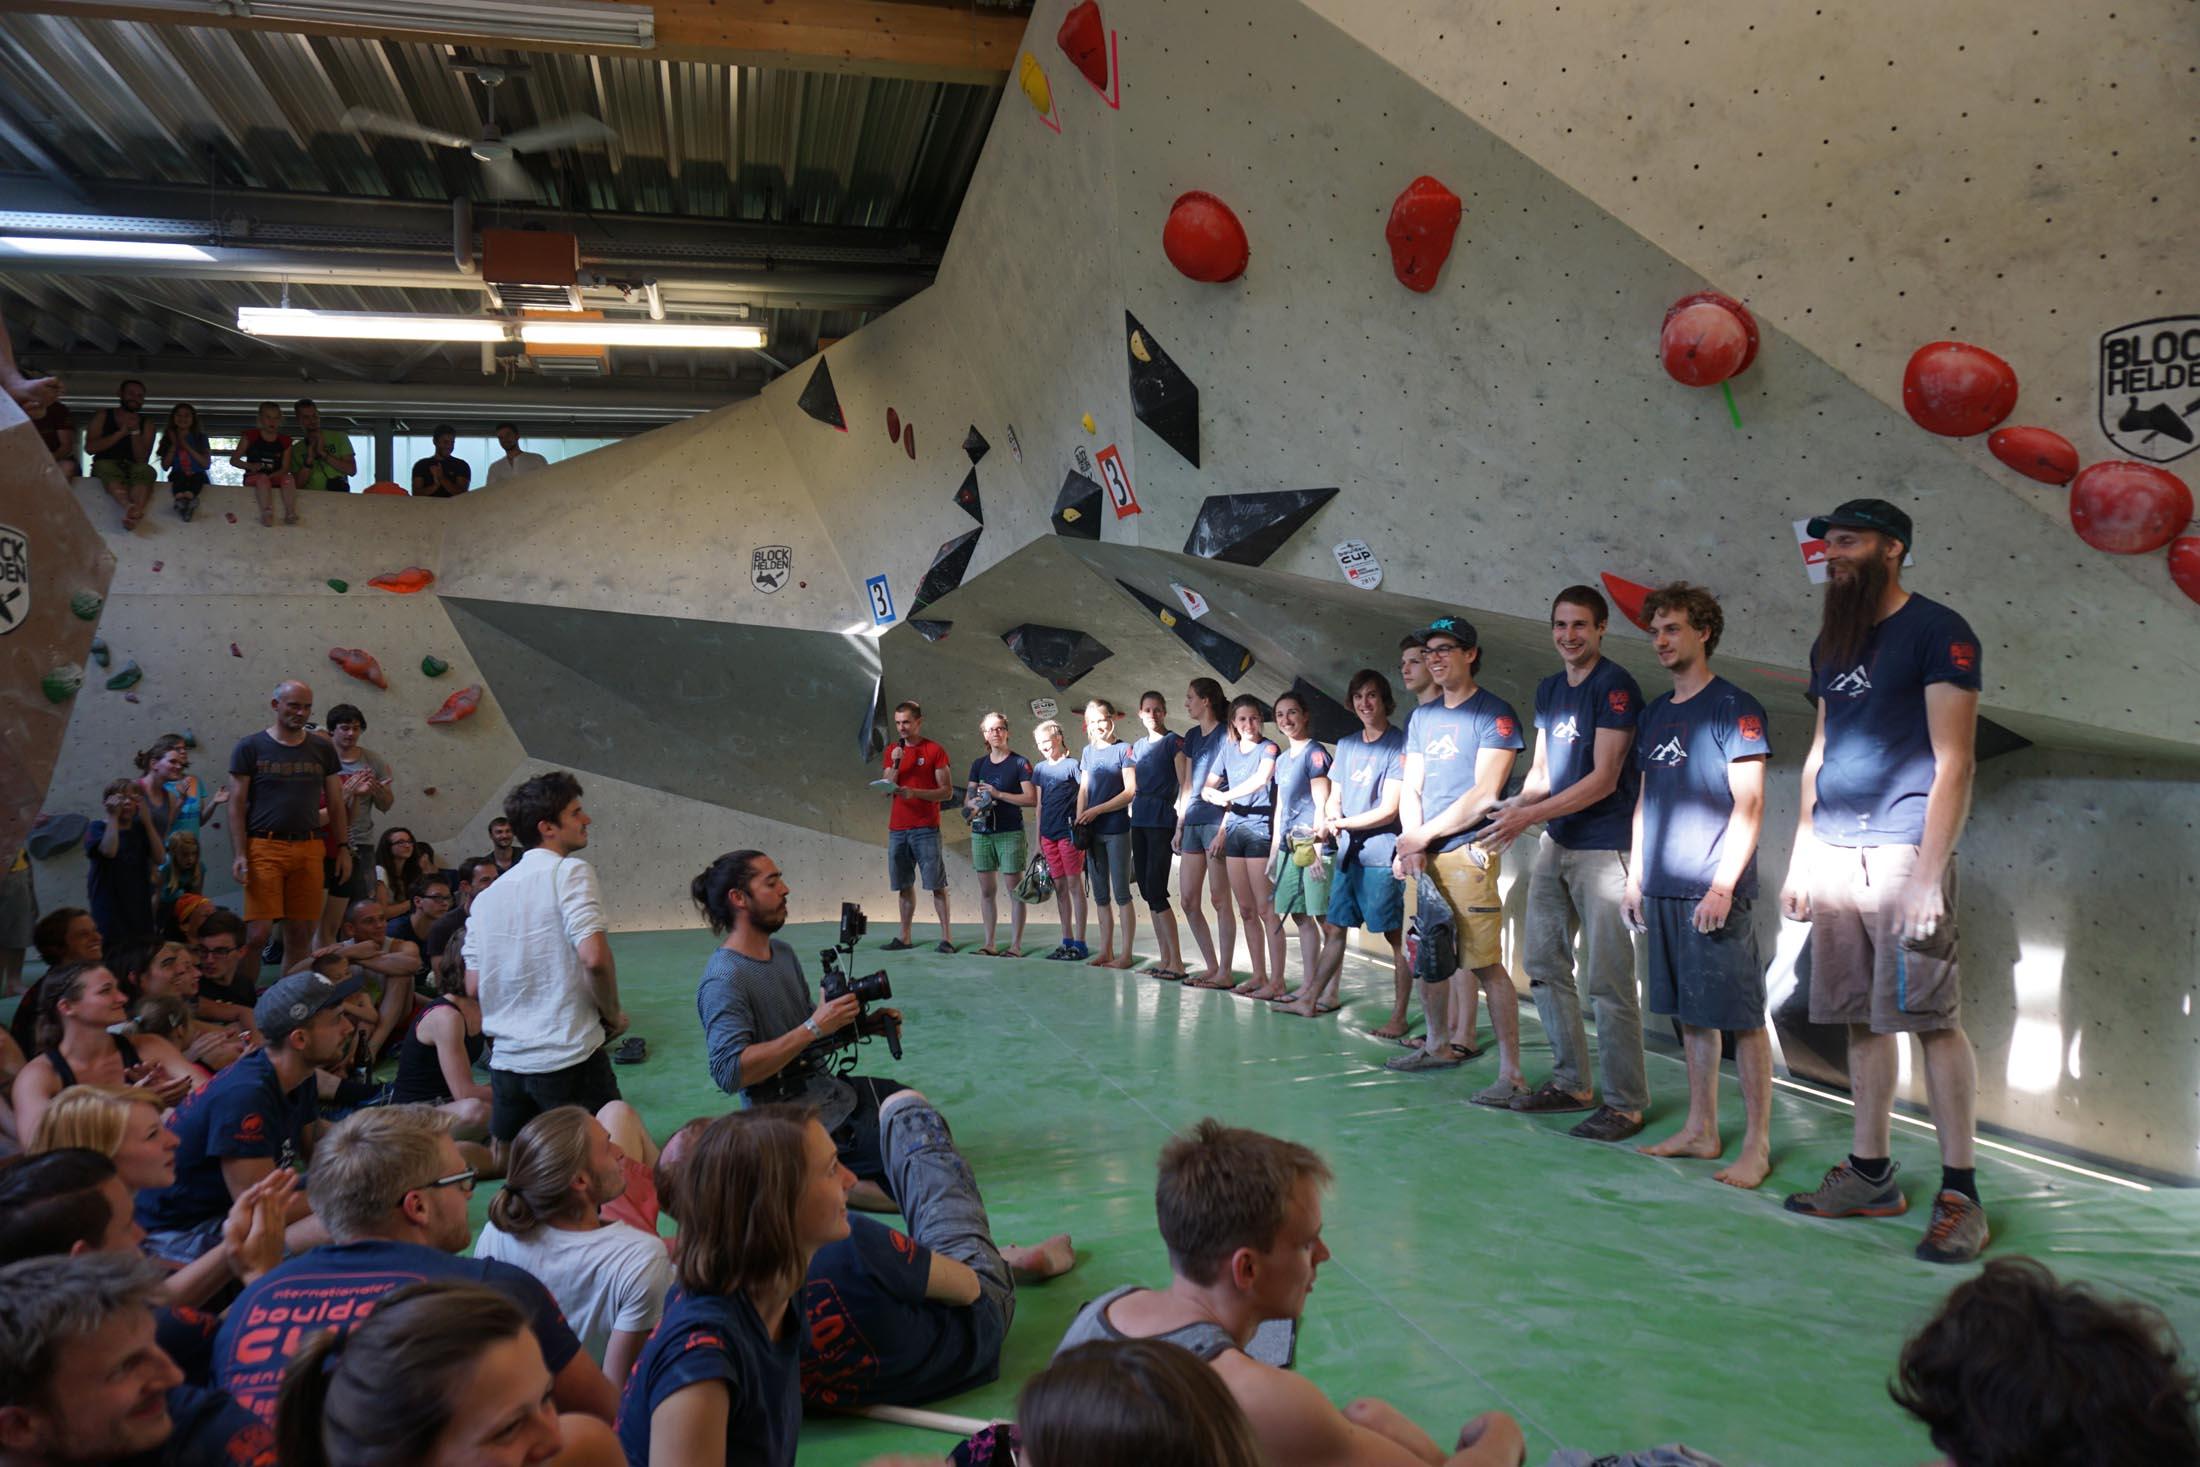 Finale, internationaler bouldercup Frankenjura 2016, BLOCKHELDEN Erlangen, Mammut, Bergfreunde.de, Boulderwettkampf07092016448